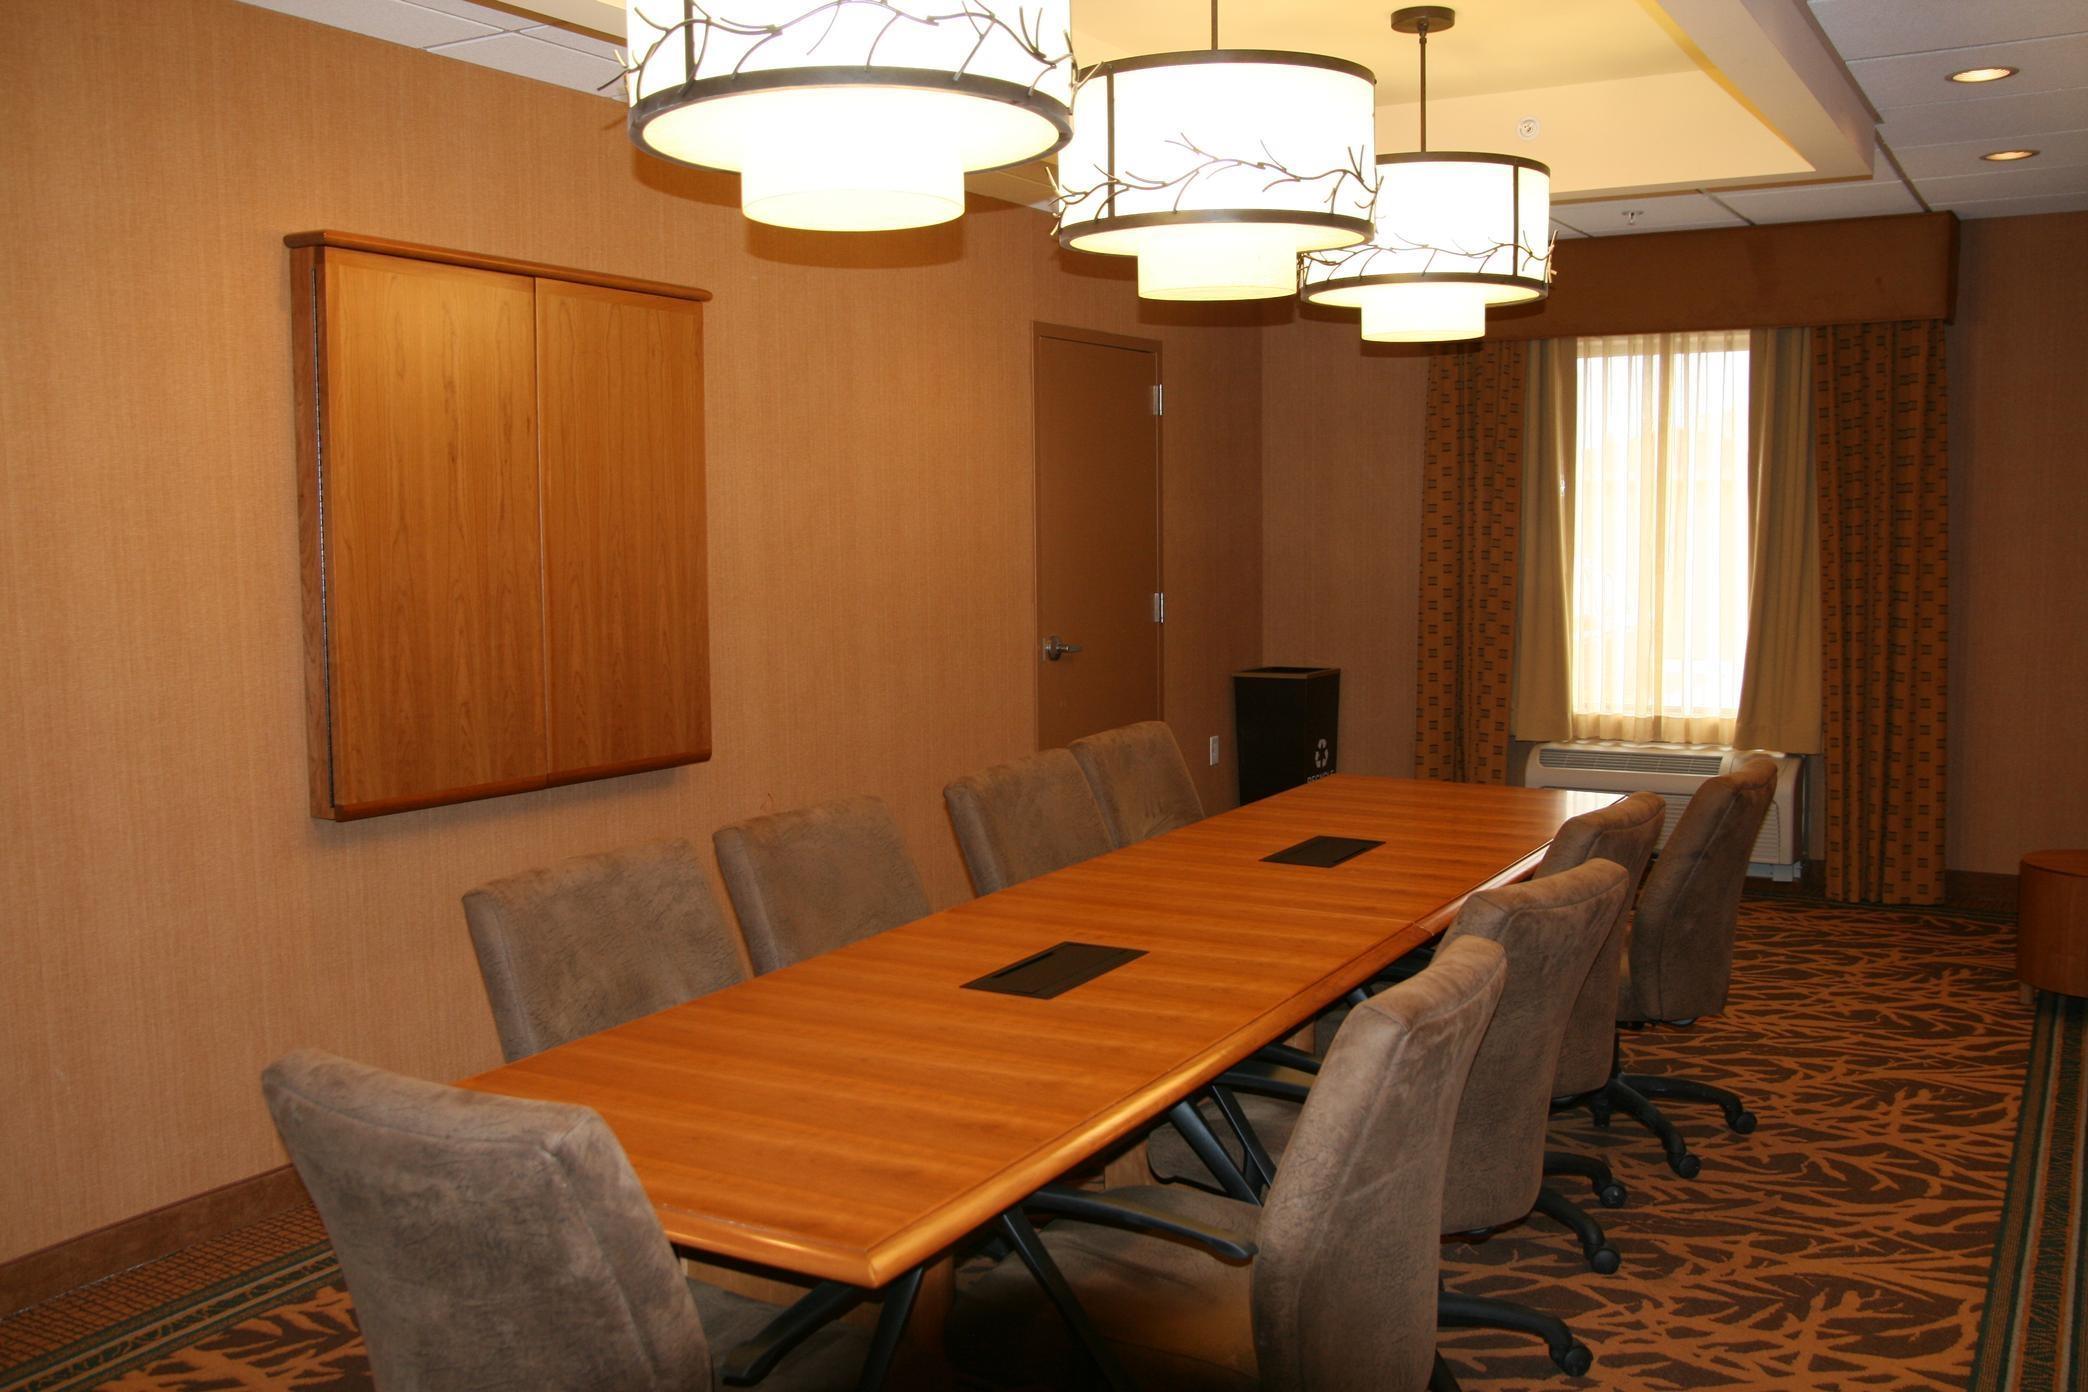 Hampton Inn & Suites Riverton image 46